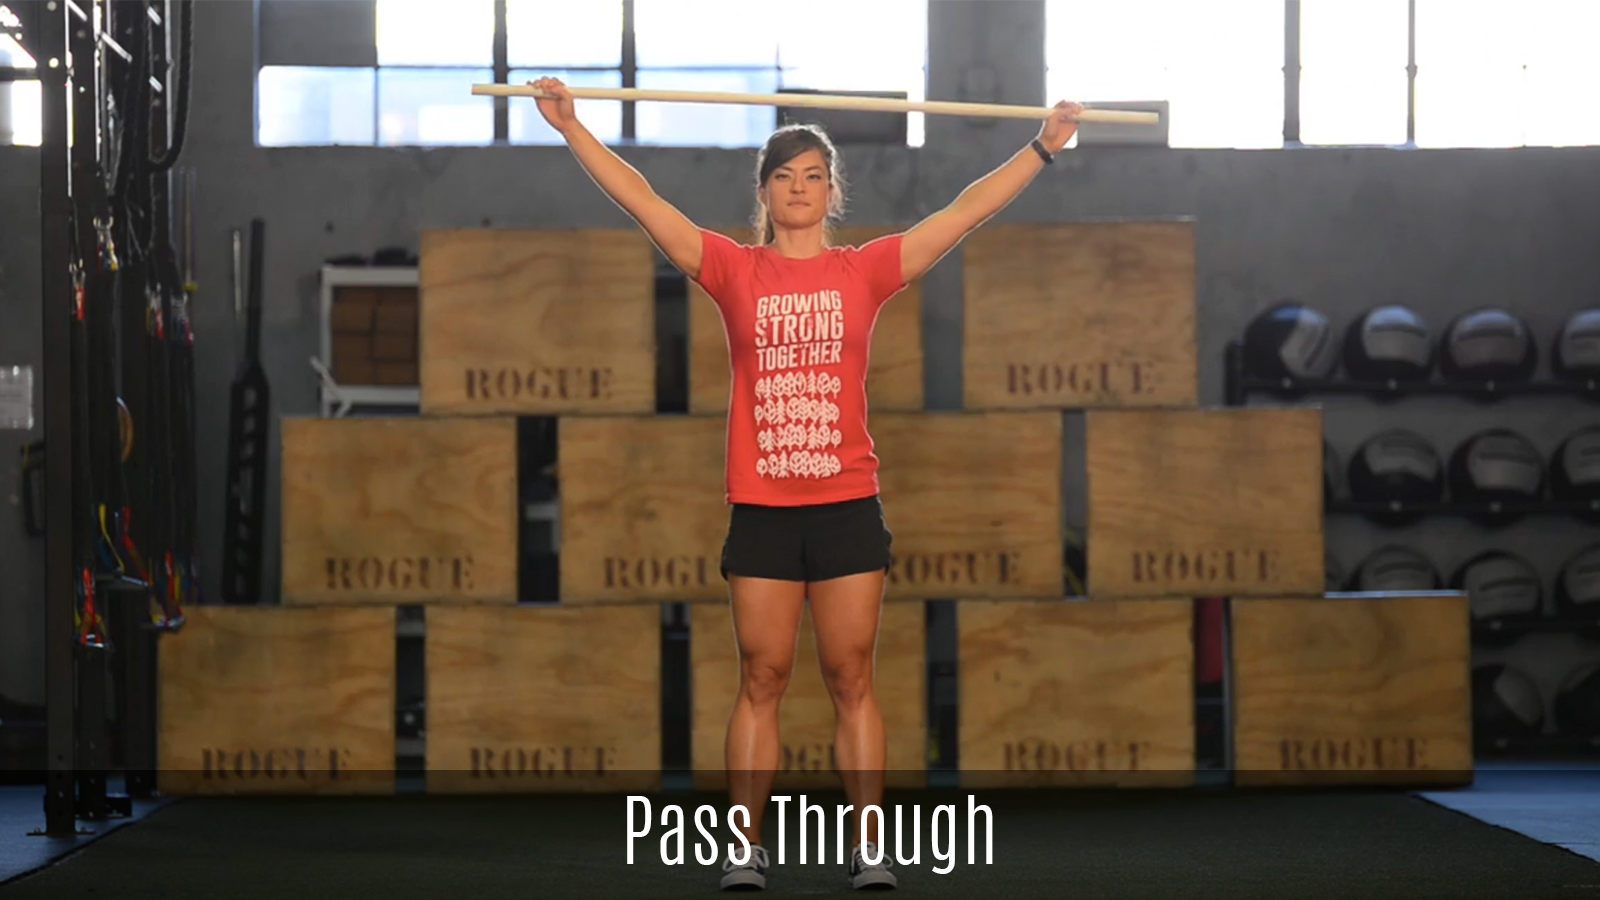 pass through movement demo using pole